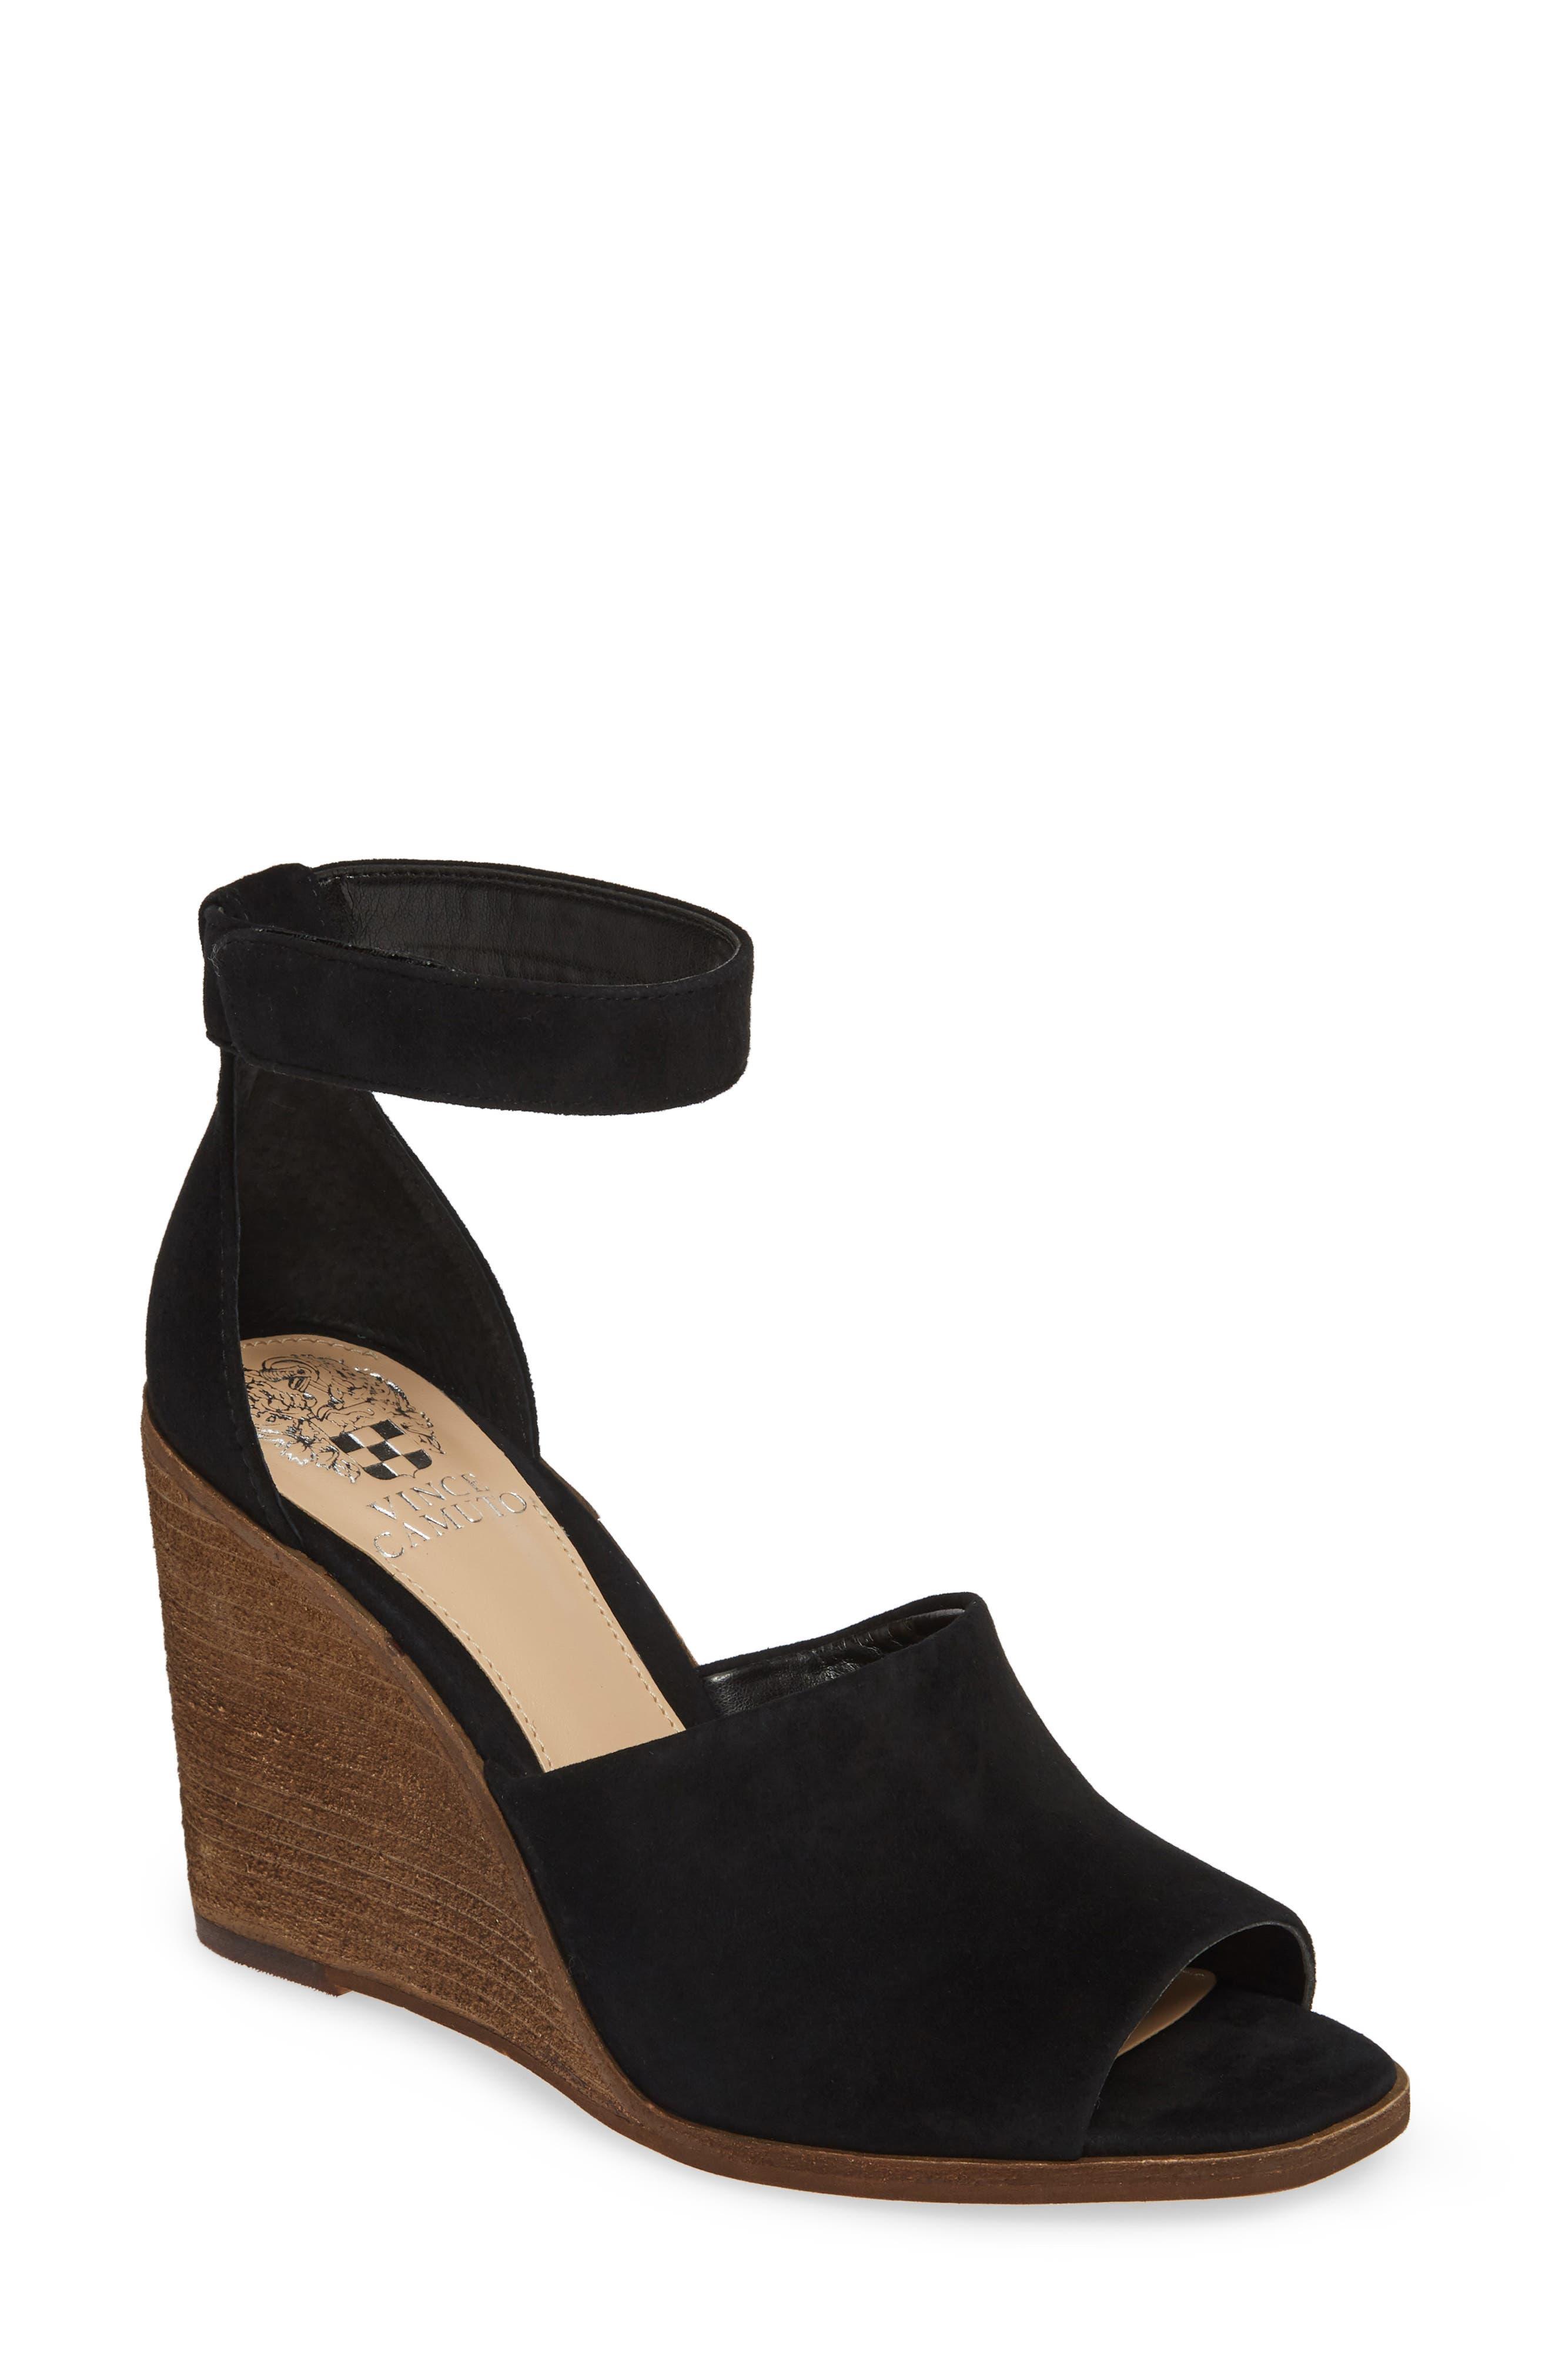 VINCE CAMUTO Deedriana Wedge Sandal, Main, color, BLACK SUEDE